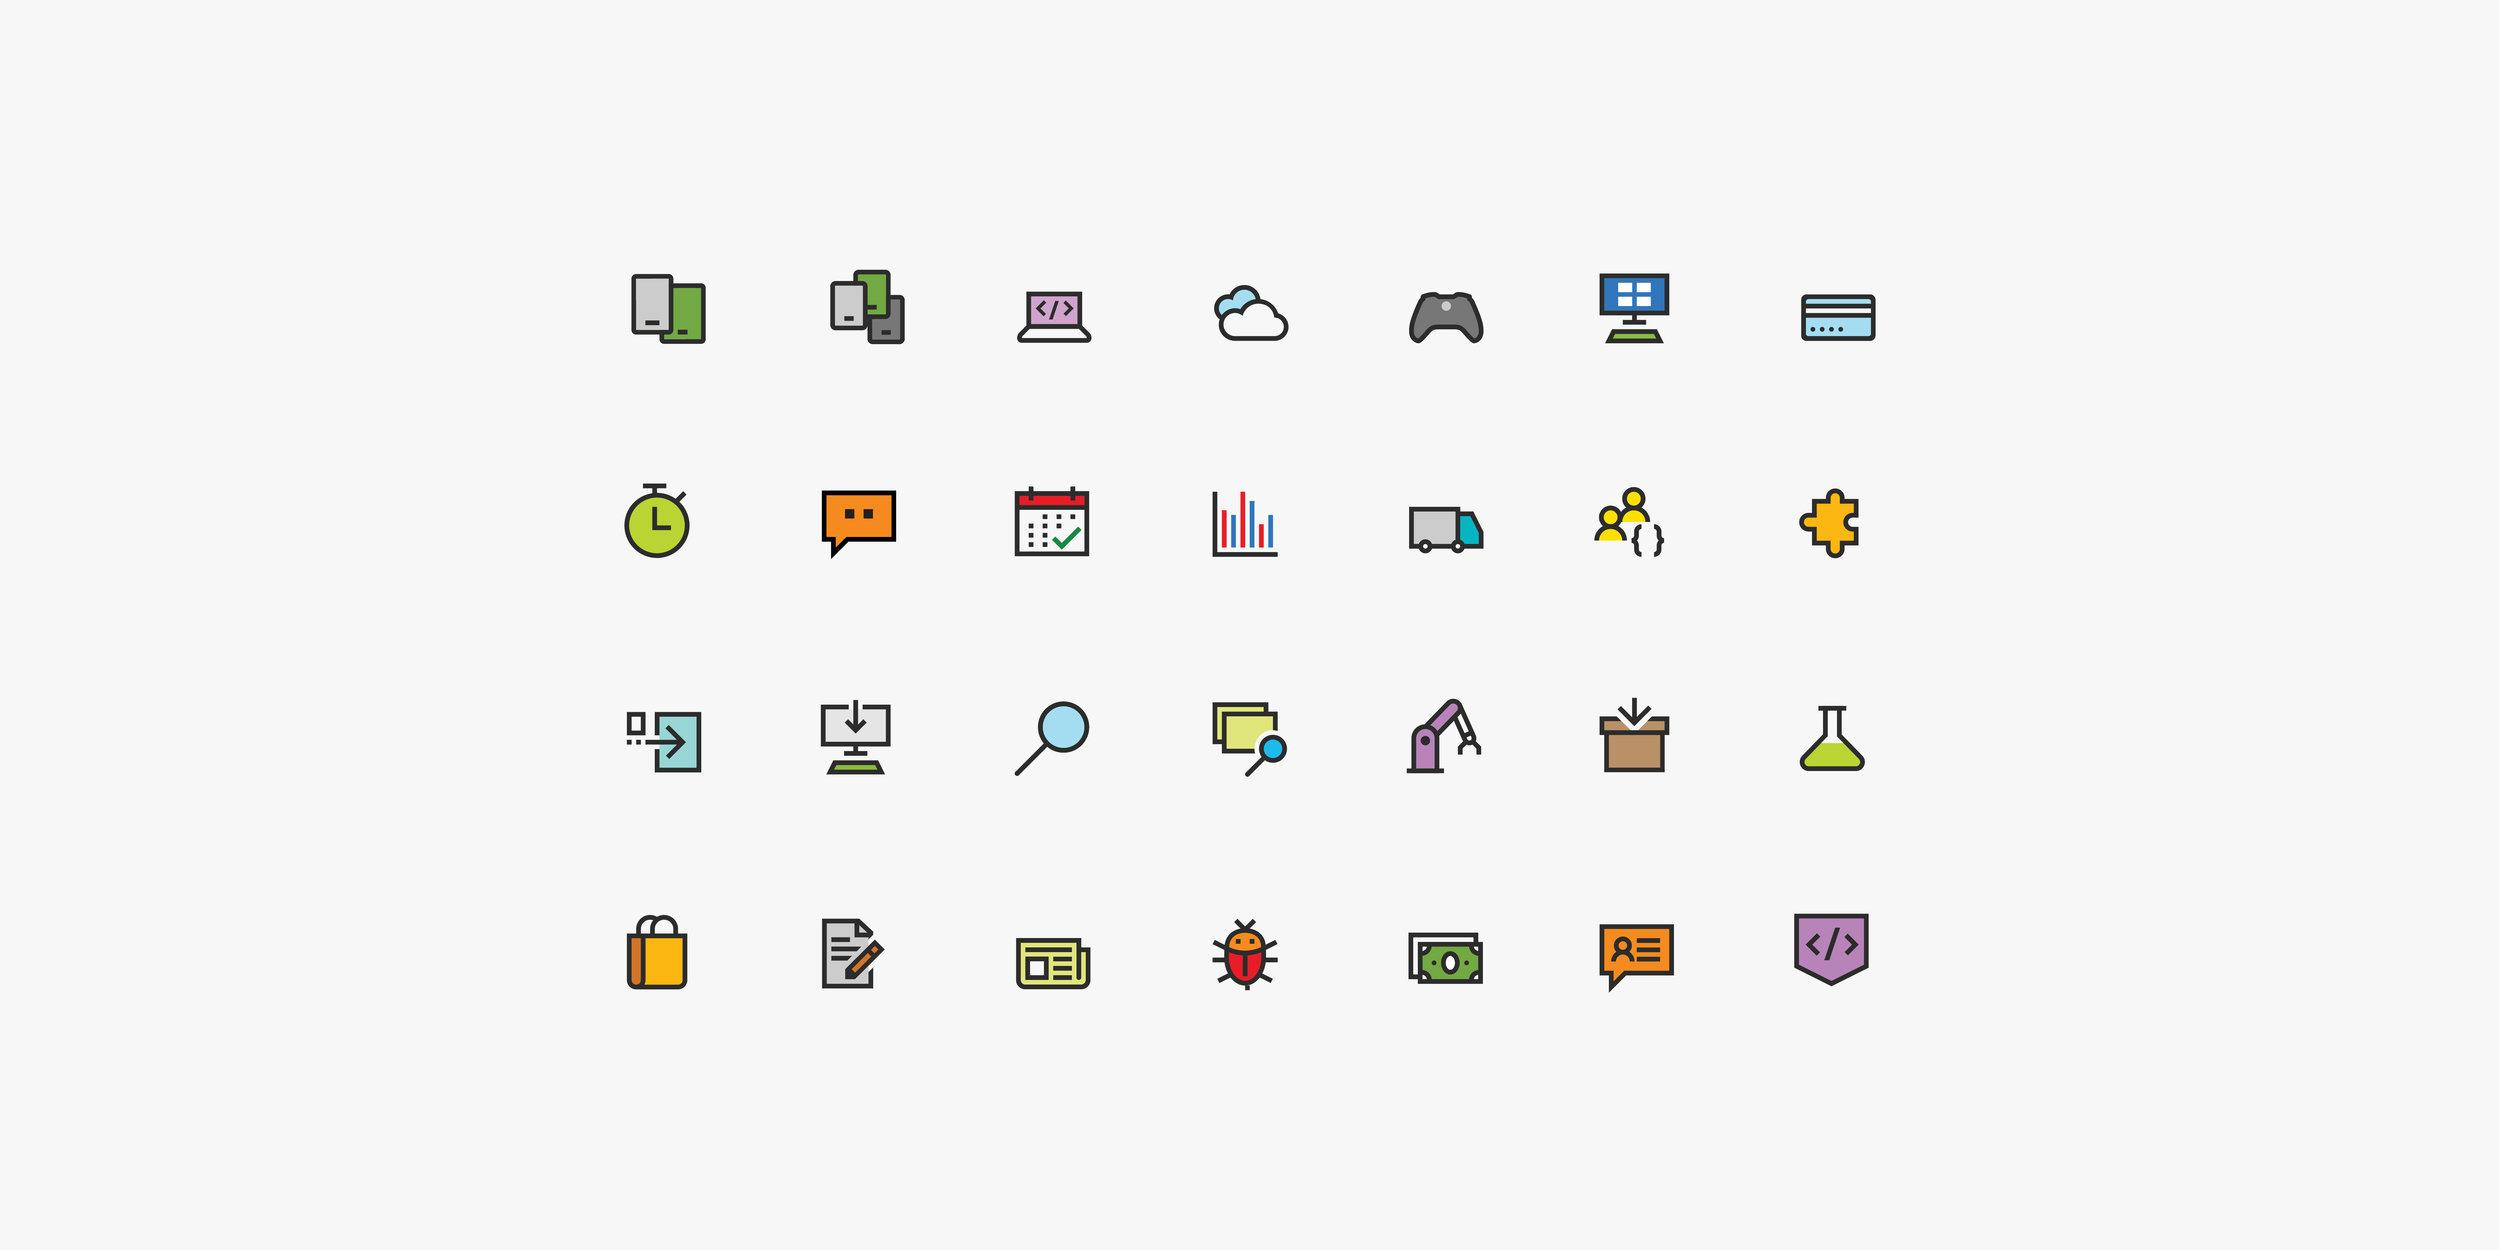 Microsoft-icons-11.jpg